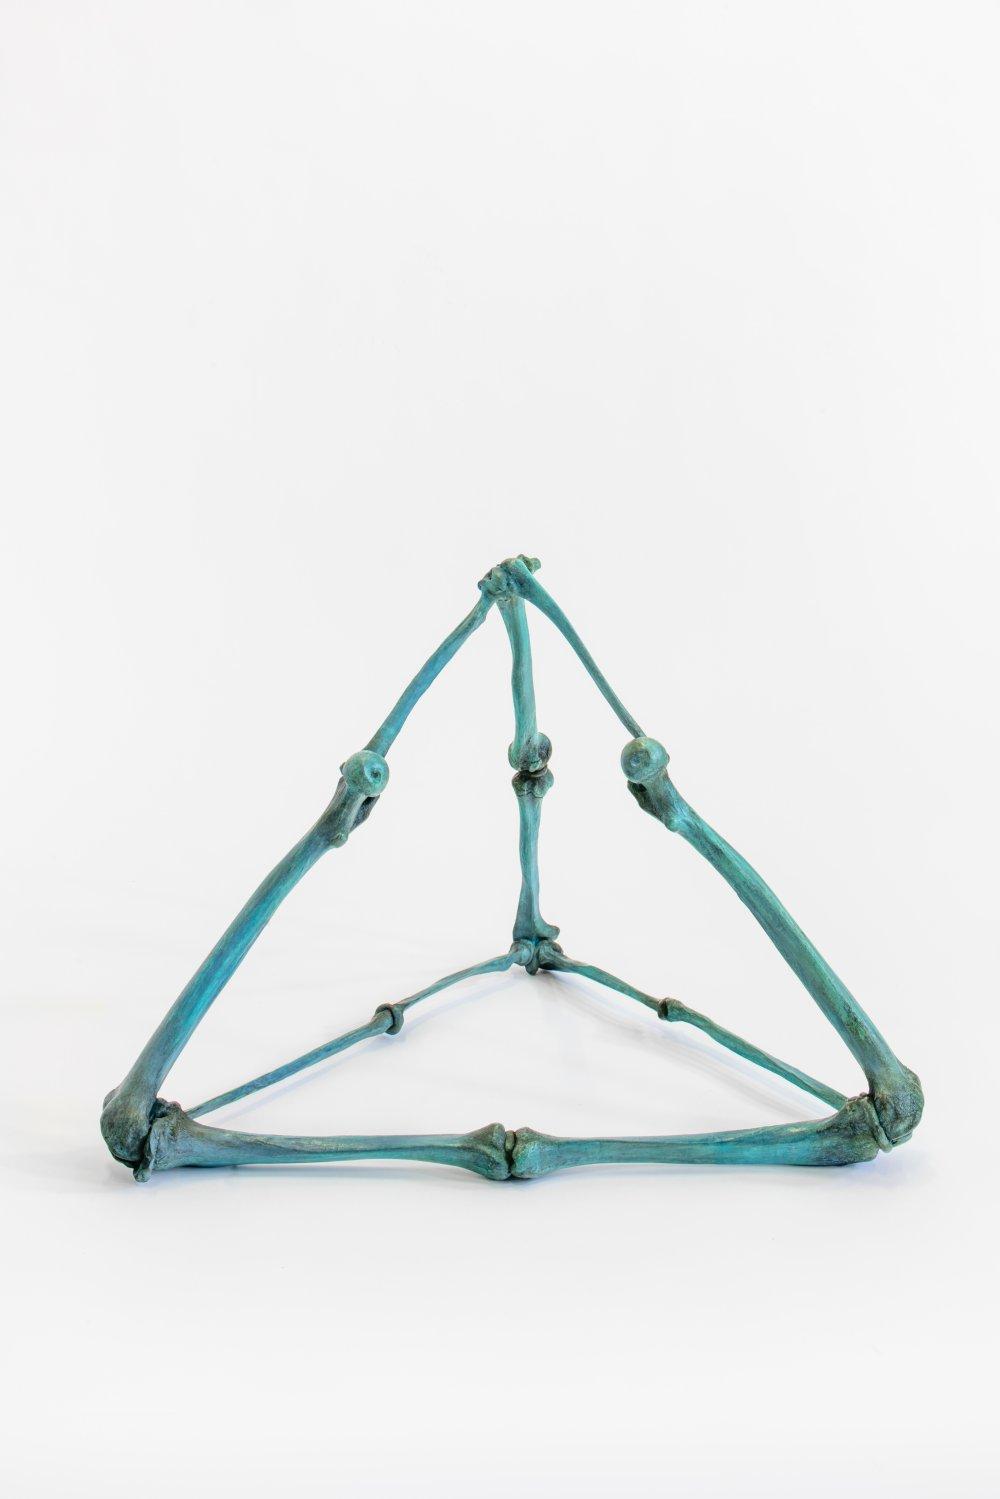 Pyramid'os - Le Buisson